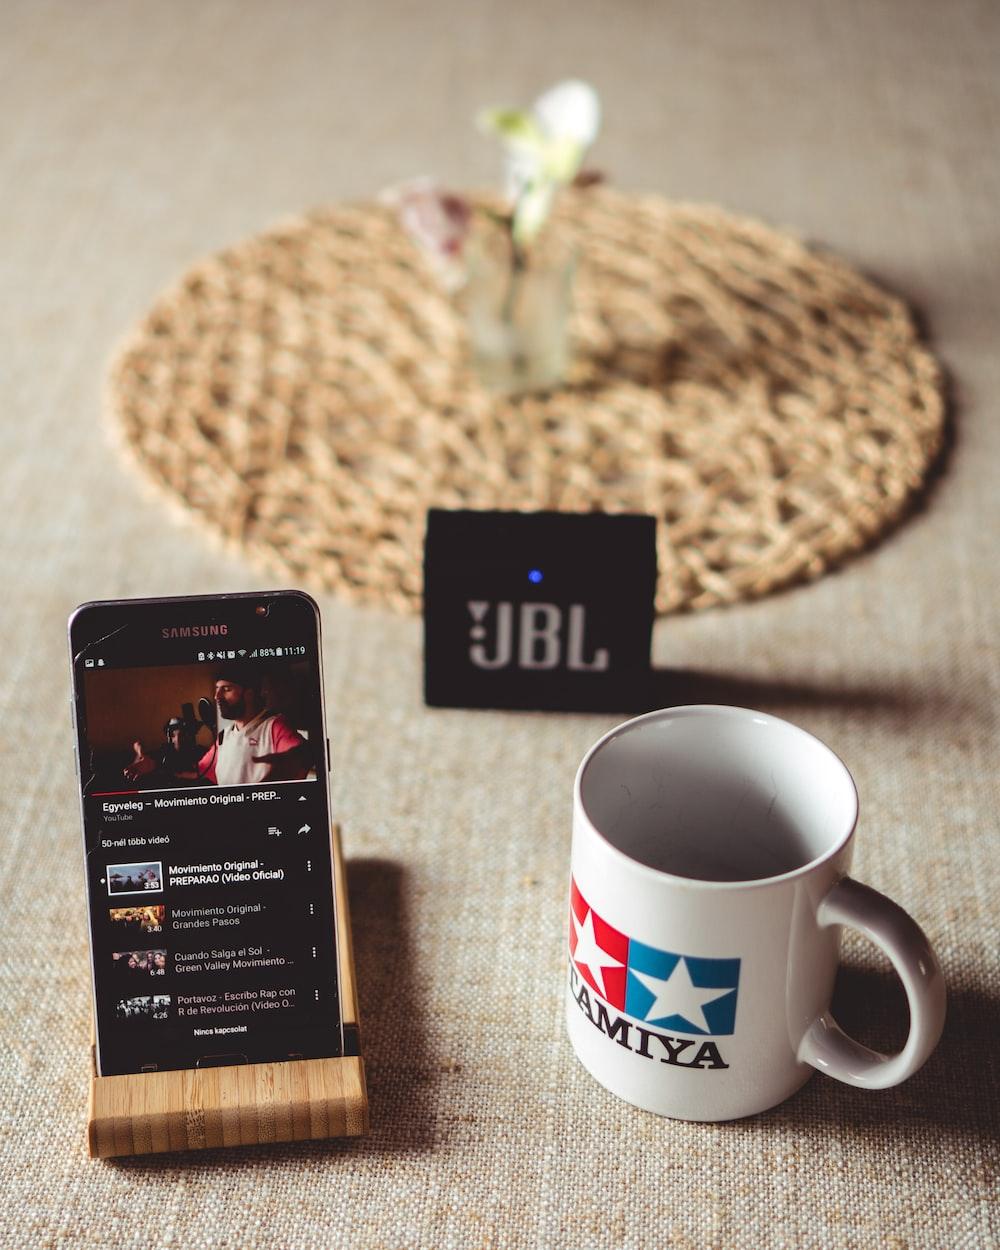 black Samsung smartphone playing video beside white ceramic mug and black JBL Go speaker